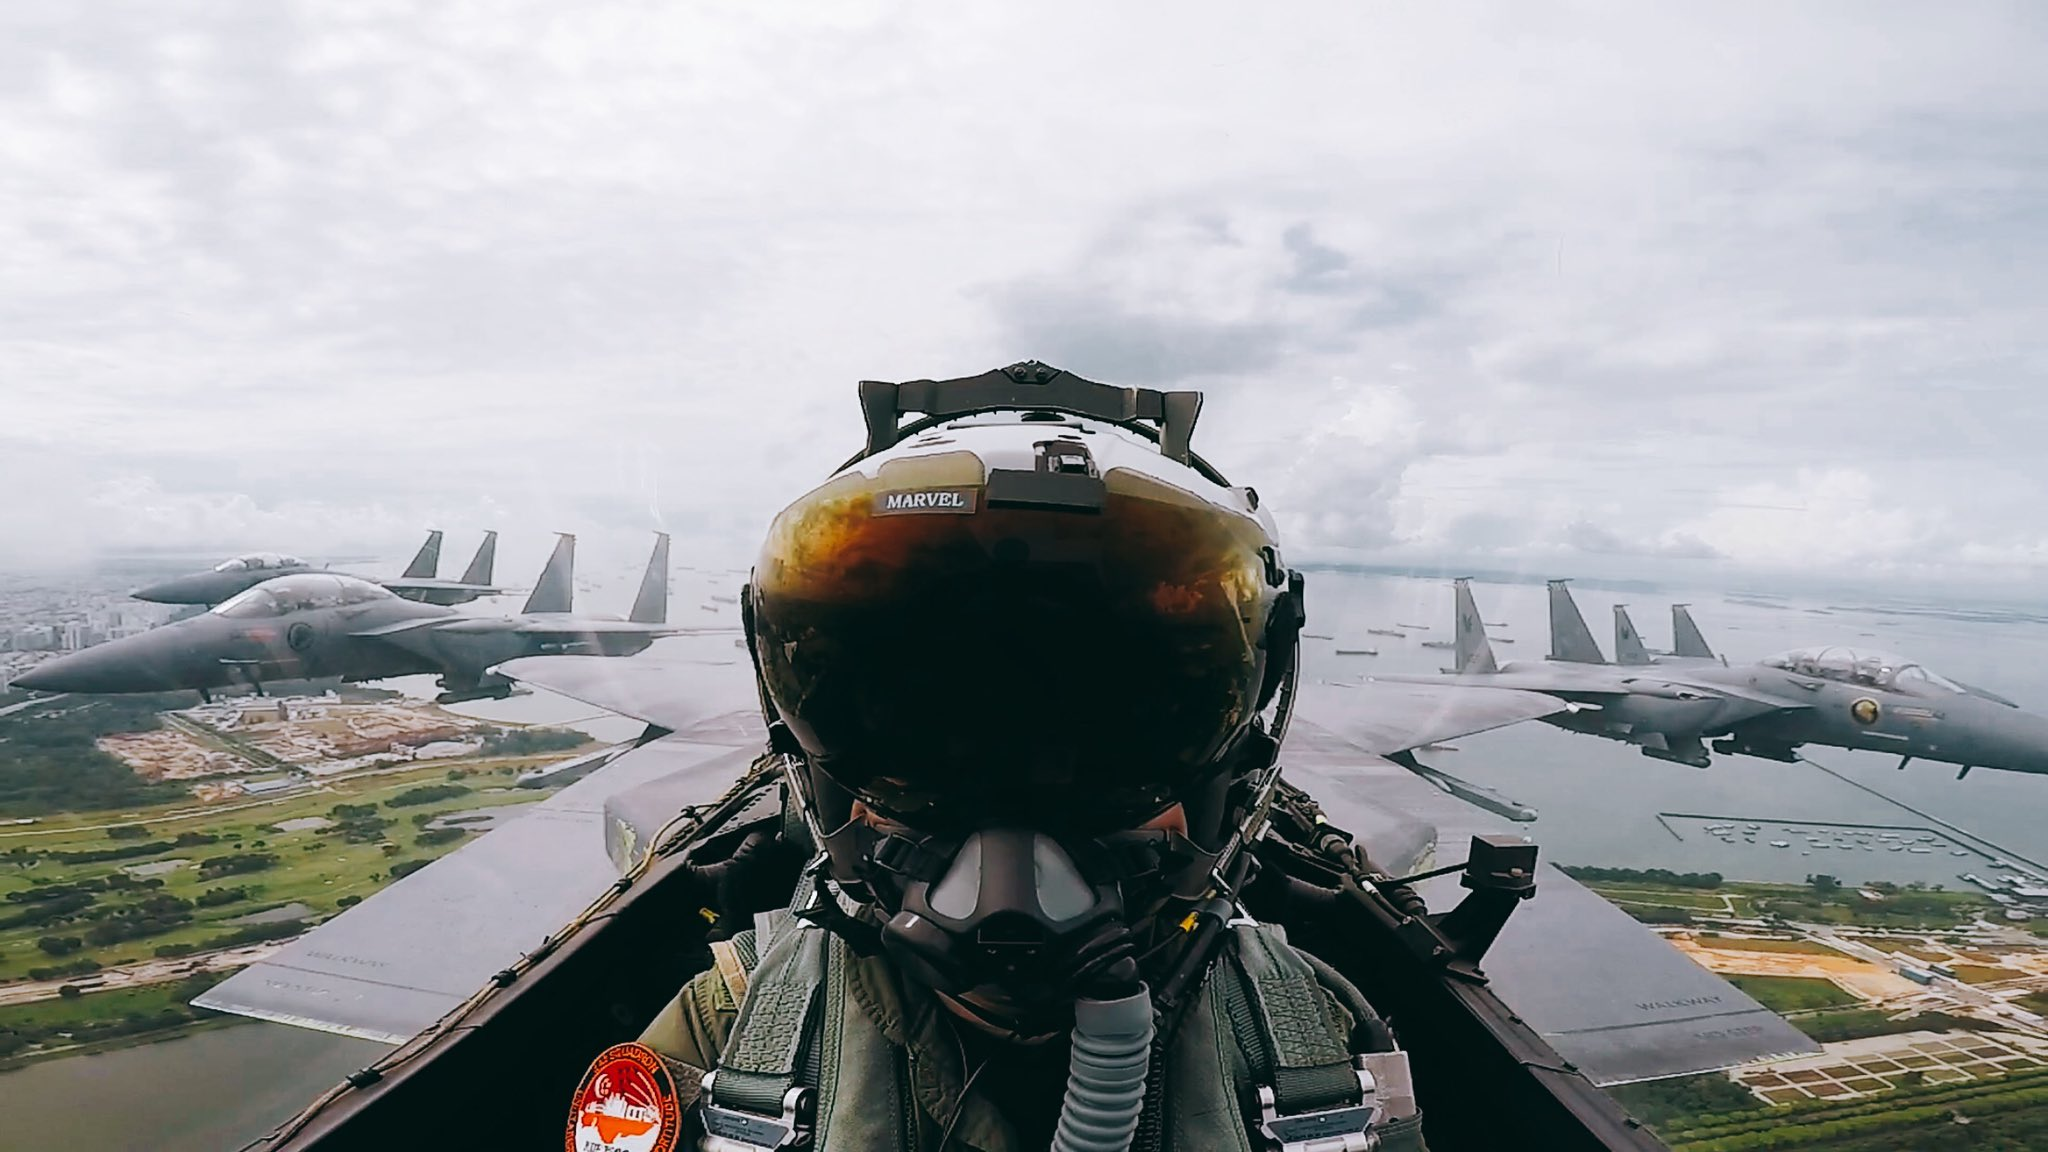 Forces armées de Singapour/Singapore Armed Forces (SAF) - Page 13 Ee8vw8FVoAEKHcQ?format=jpg&name=large